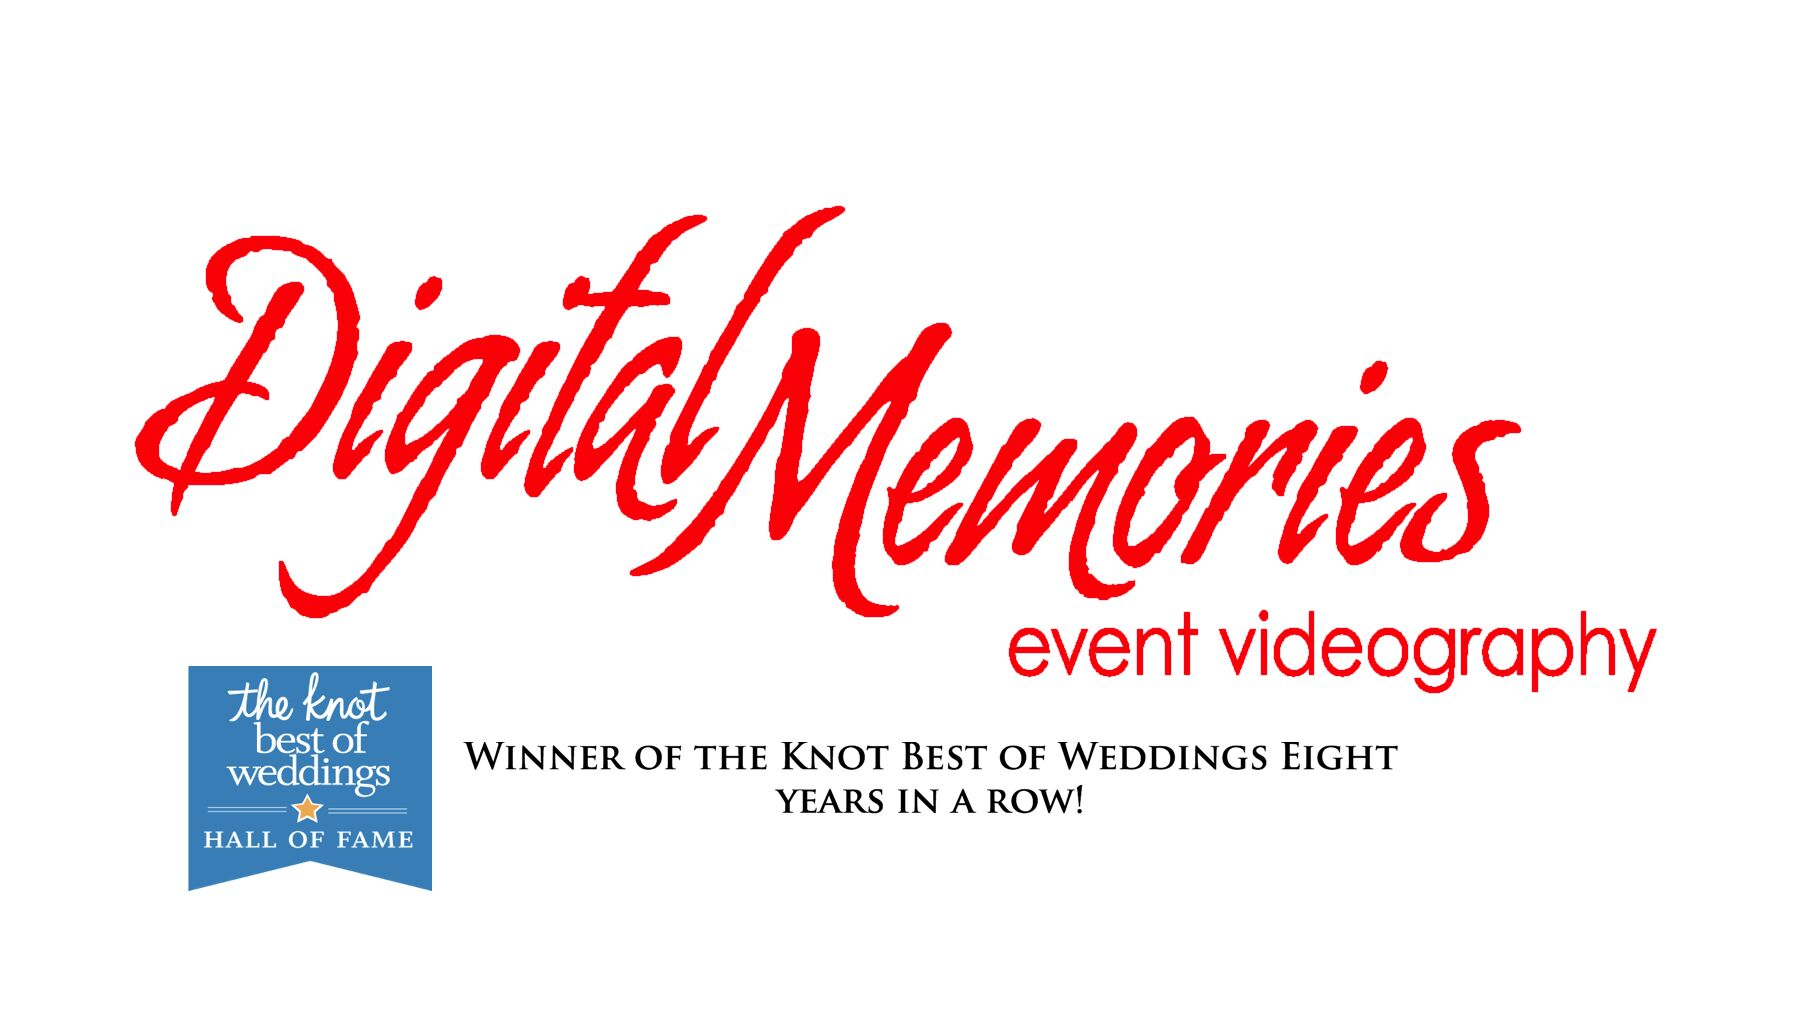 Digital Memories Event Videography - Oakland, NJ